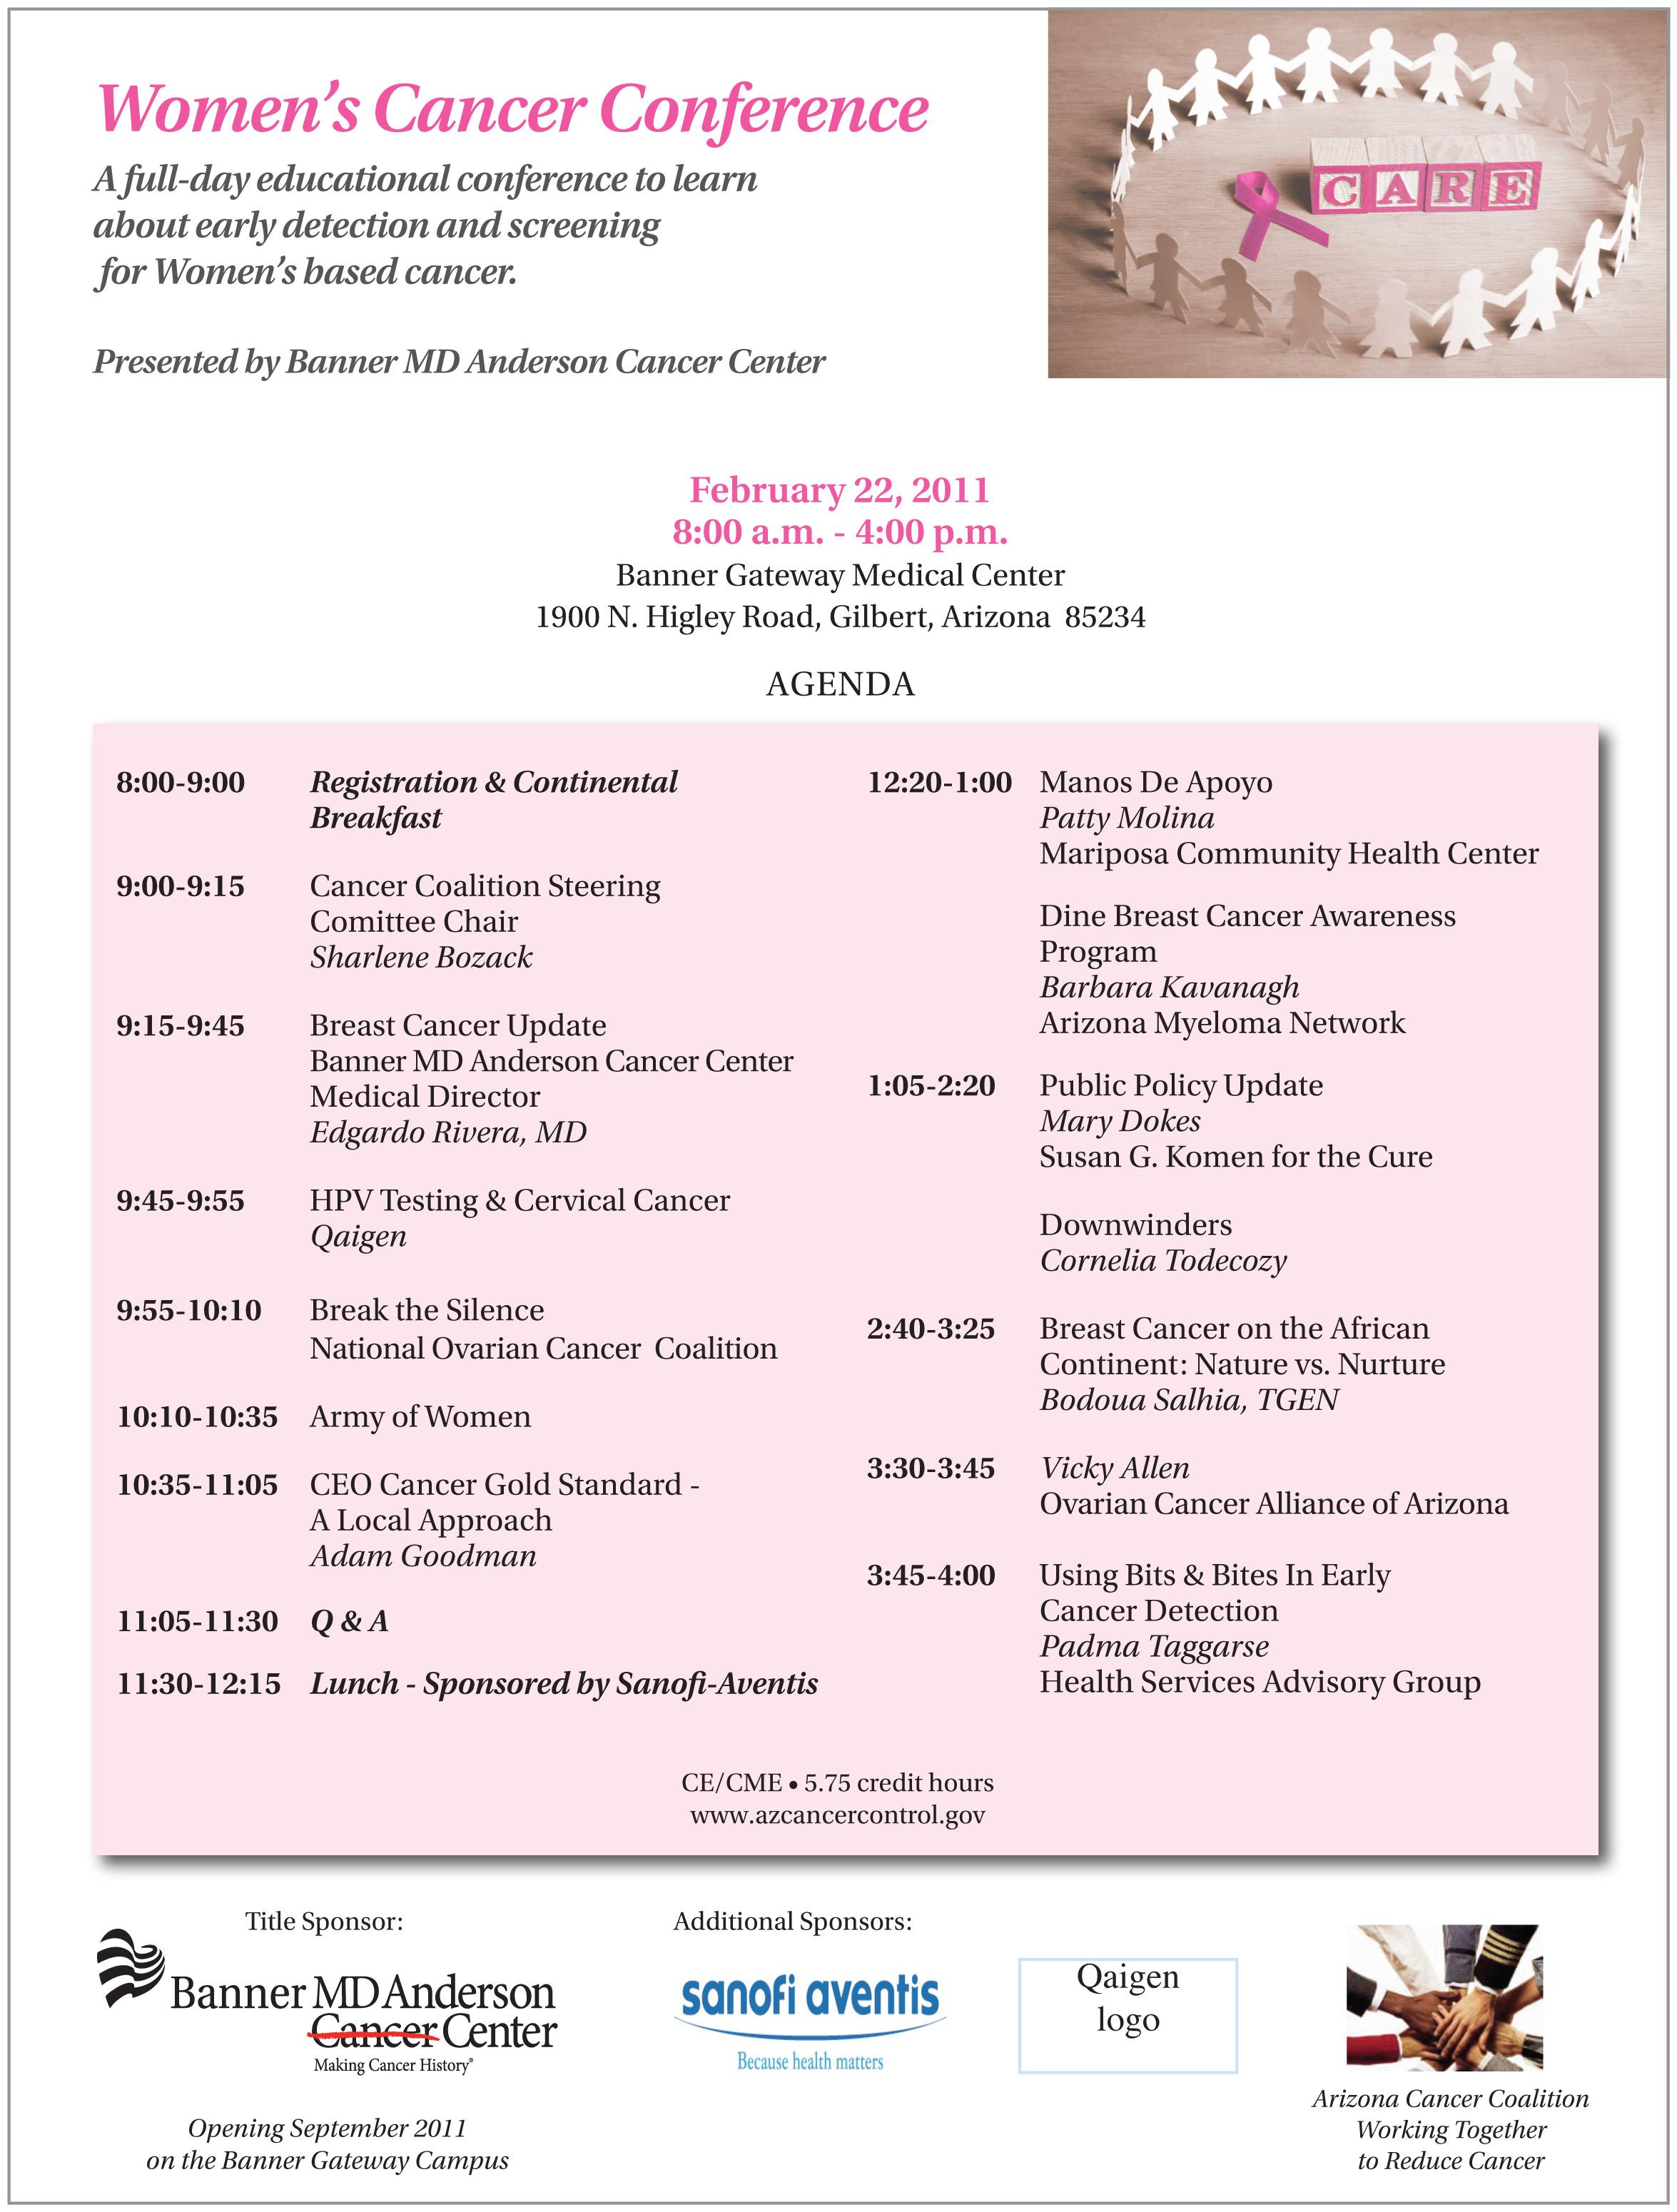 cancer  women u2019s cancer conference  u2013 feb  22nd